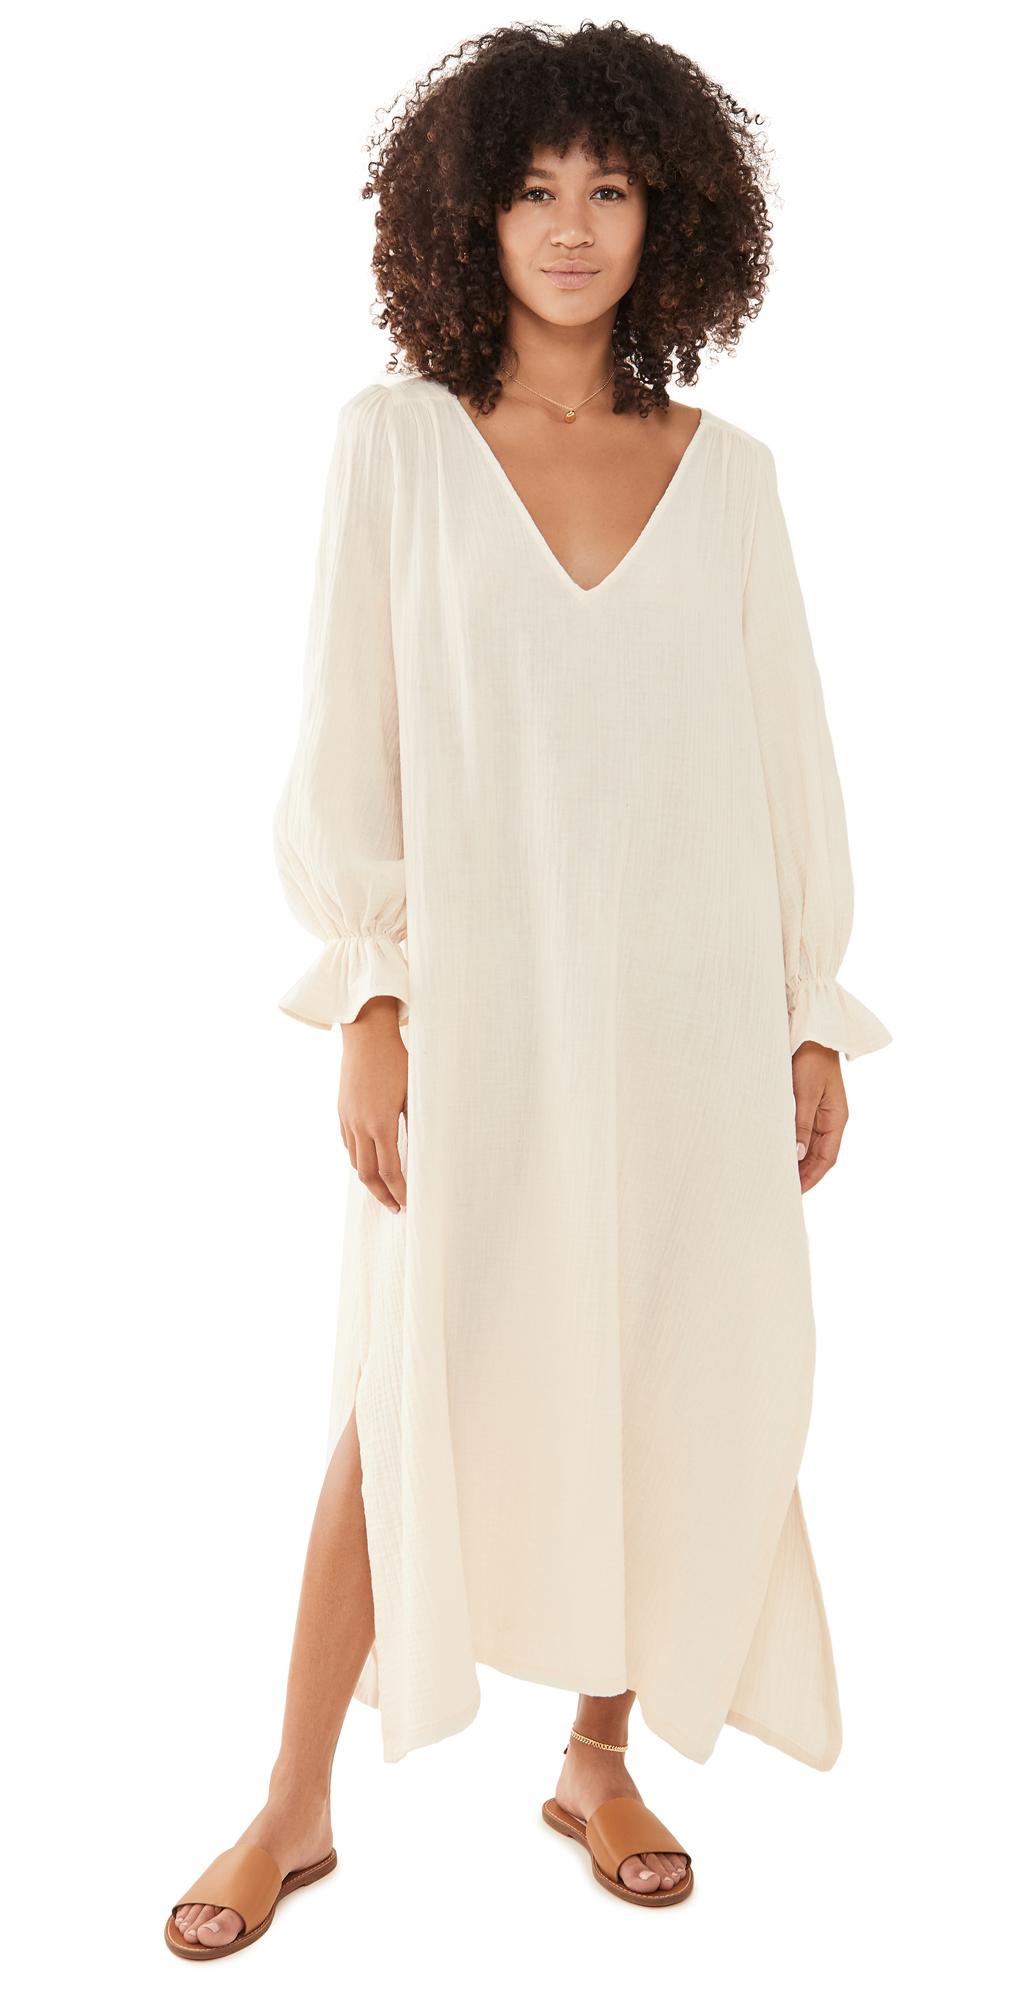 LE PETIT TROU Aurore Nightdress